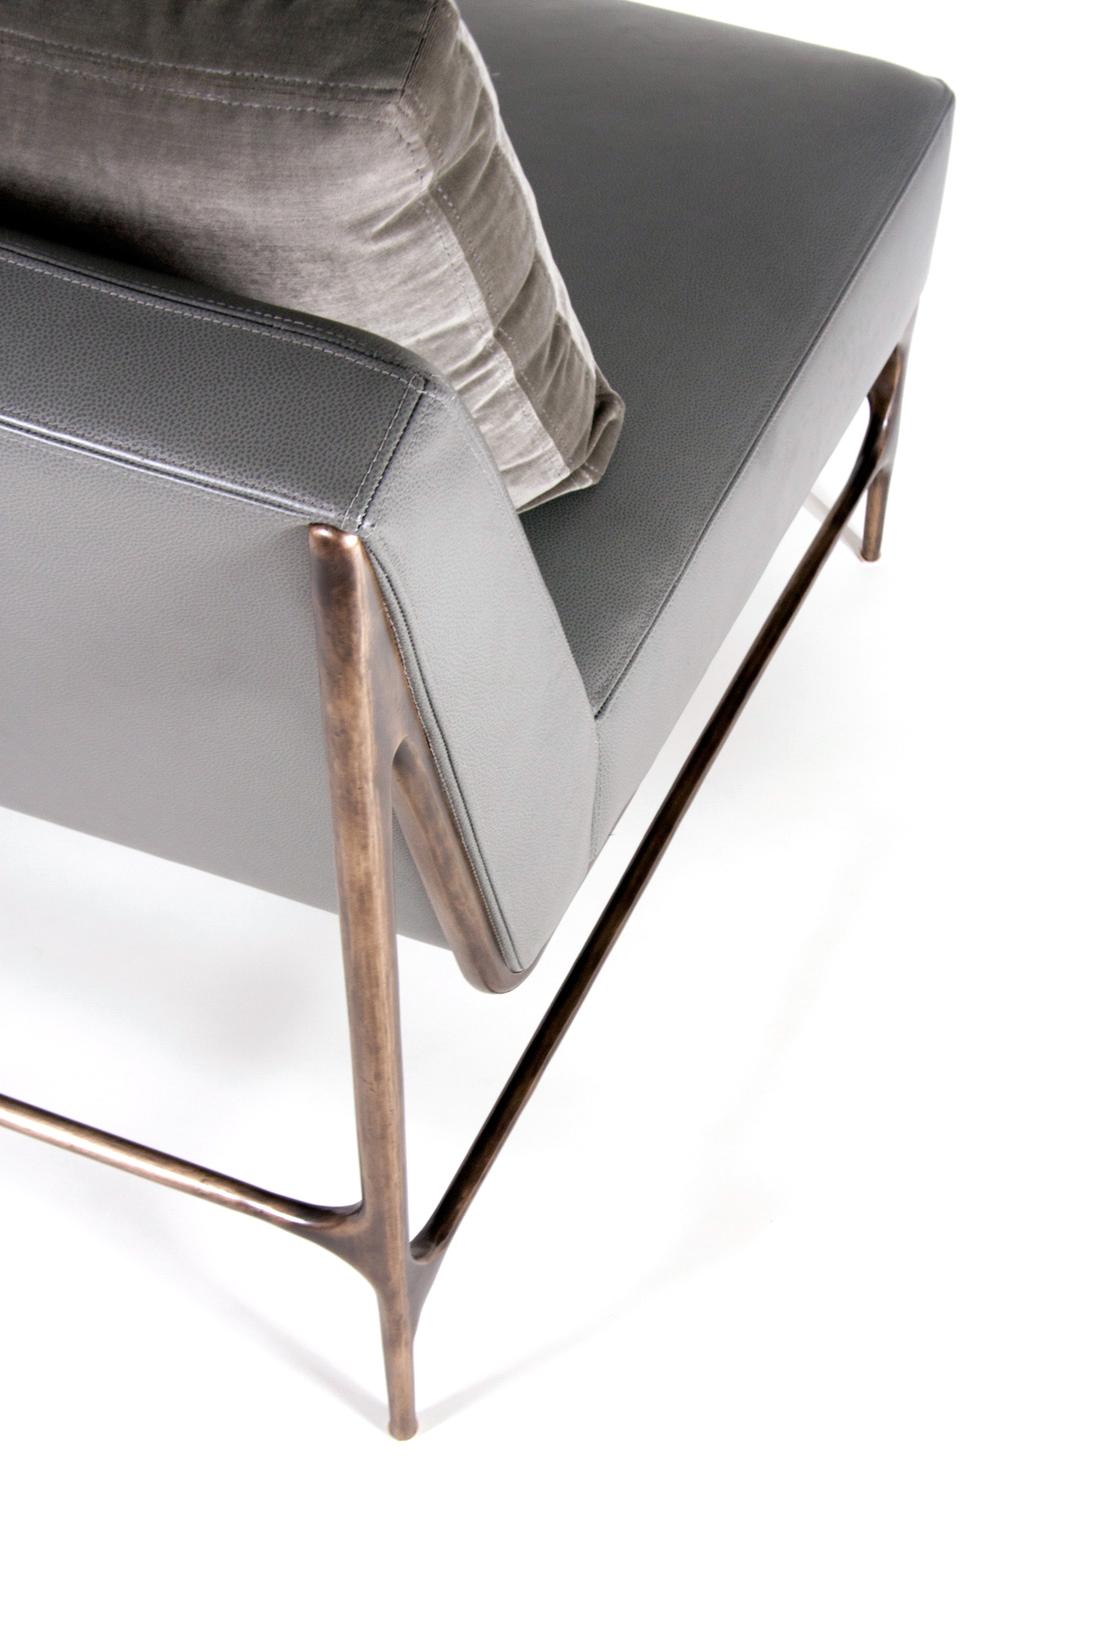 ELLIOT-EAKIN-Furniture-Crane-Slipper-Chair-Rear-Top-Detail-View.jpg